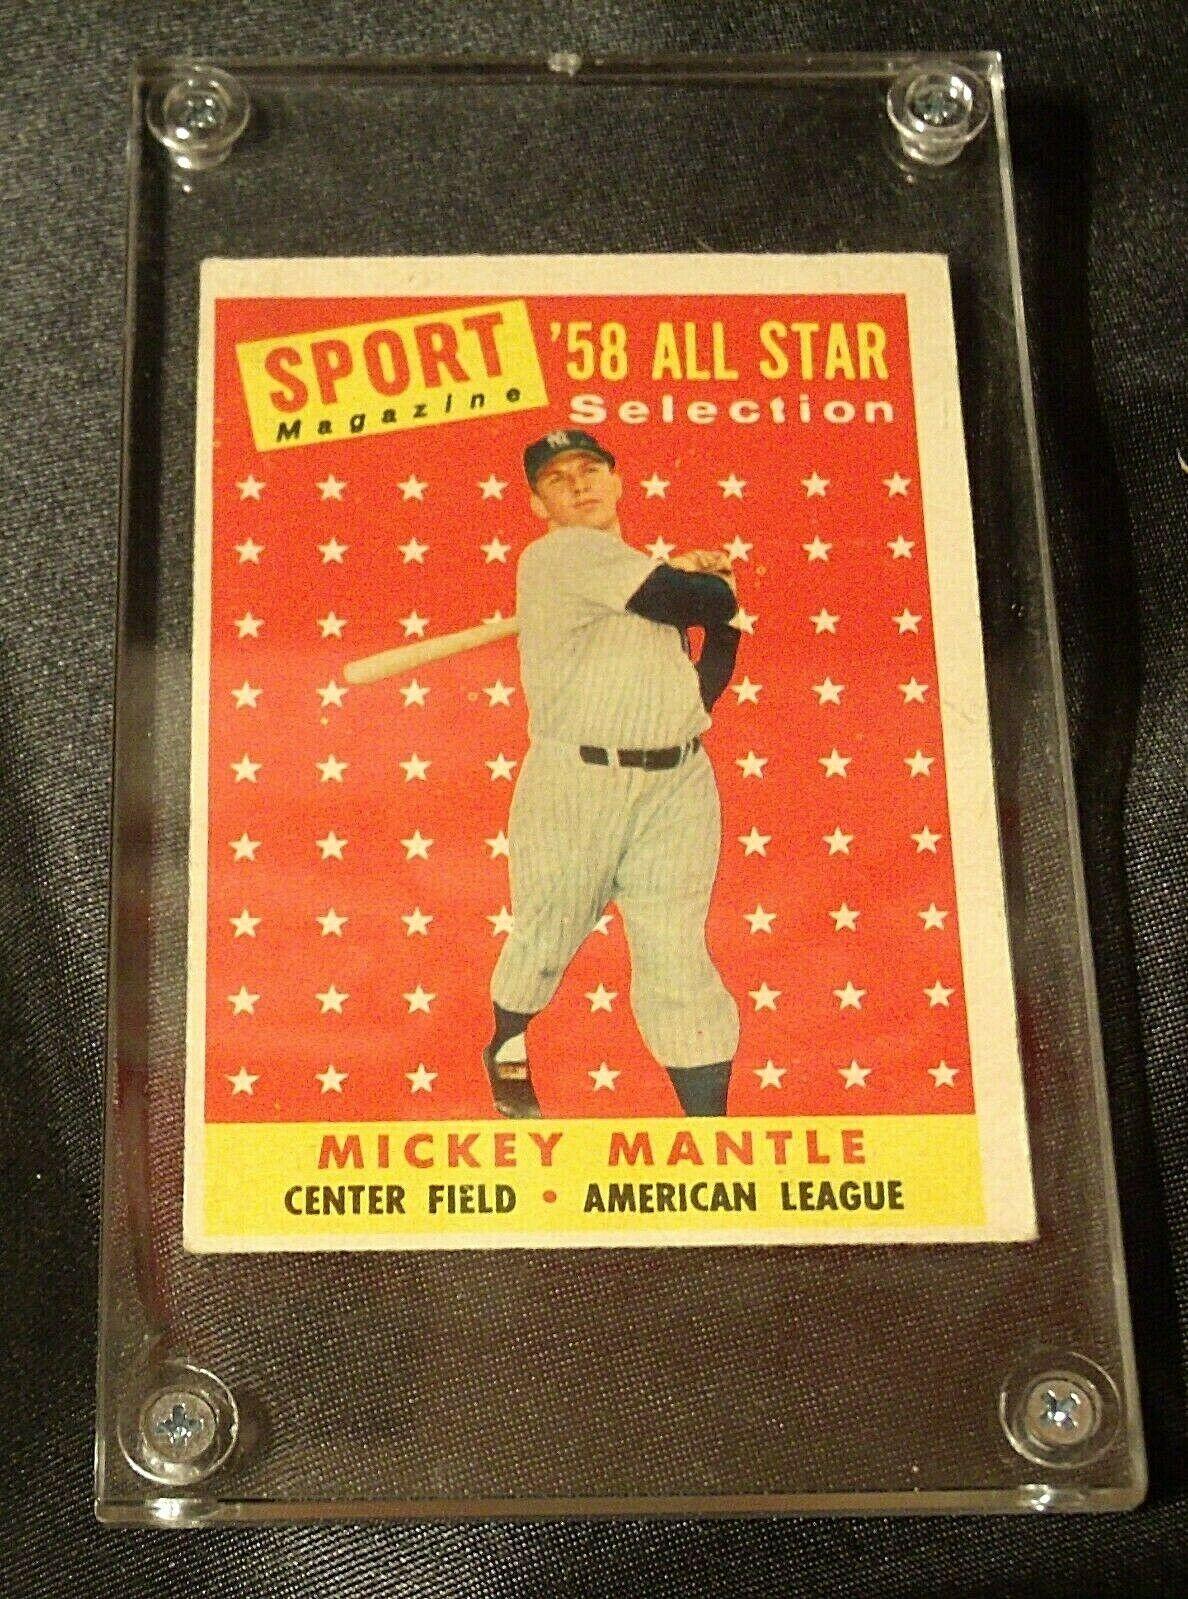 1958 Mickey Mantle Baseball Trading Card # 487 AA 19-BTC4003 Vintage Collectible